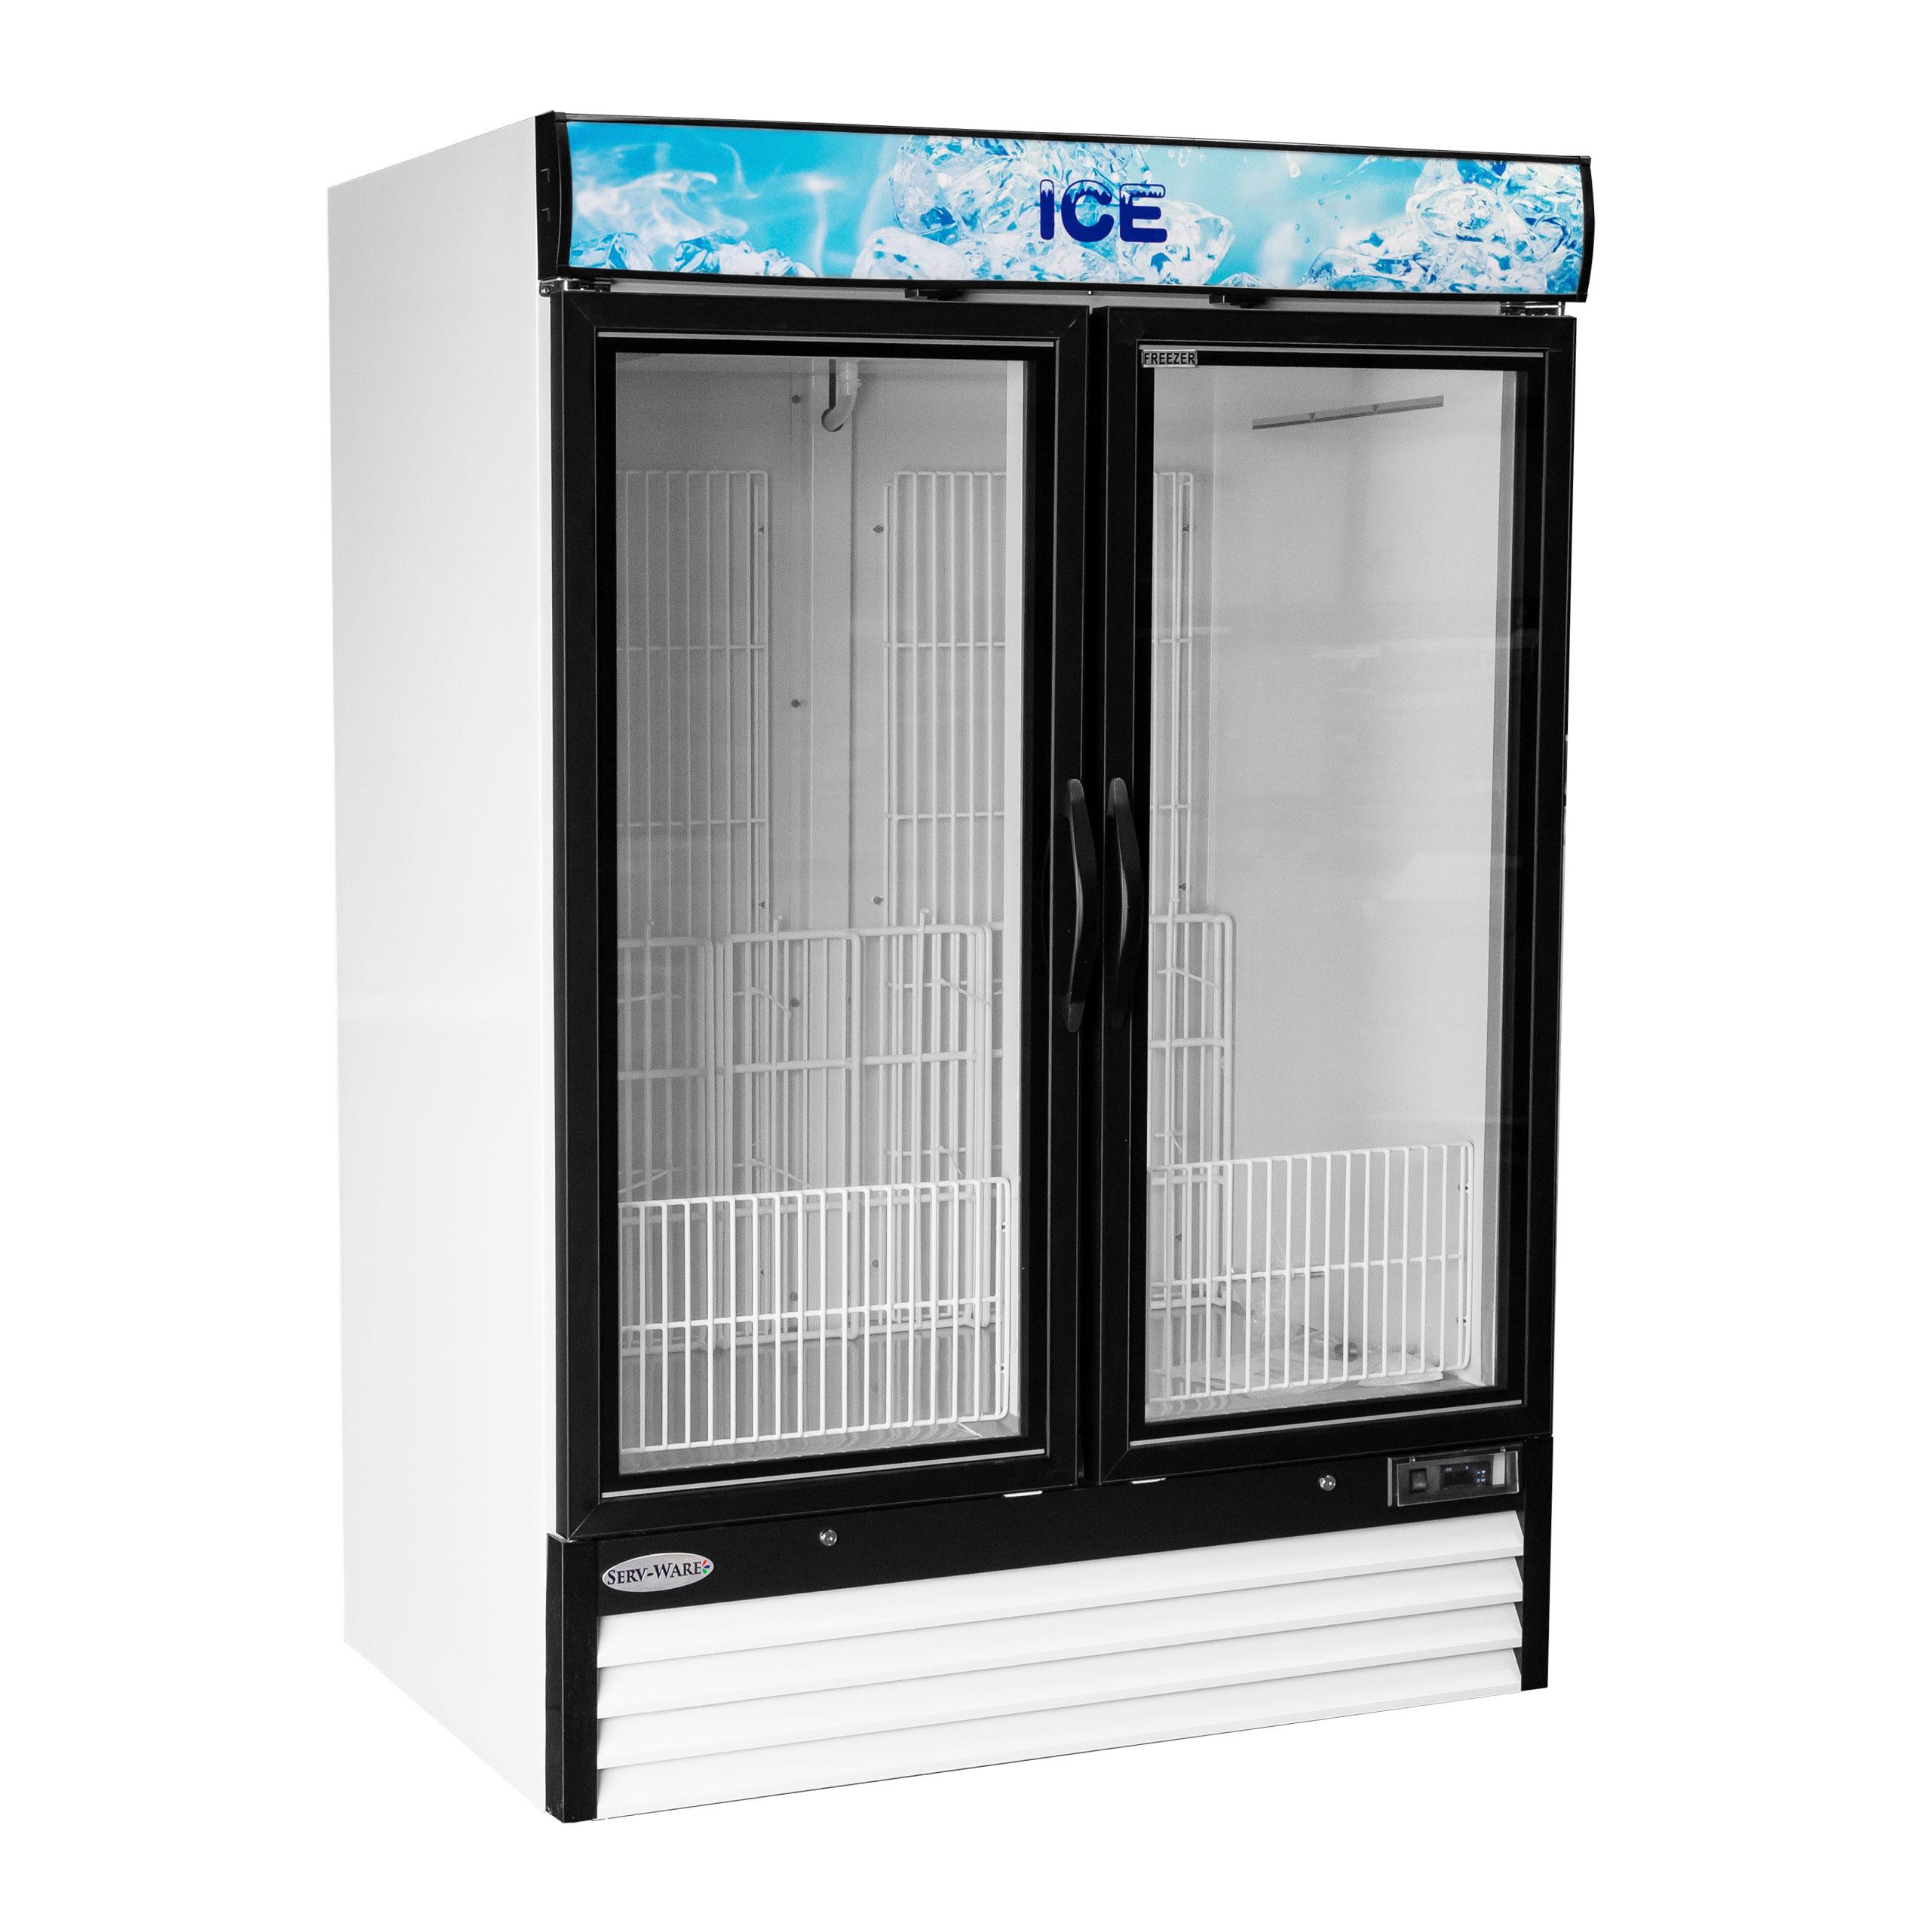 Serv-Ware IB48 ice merchandiser